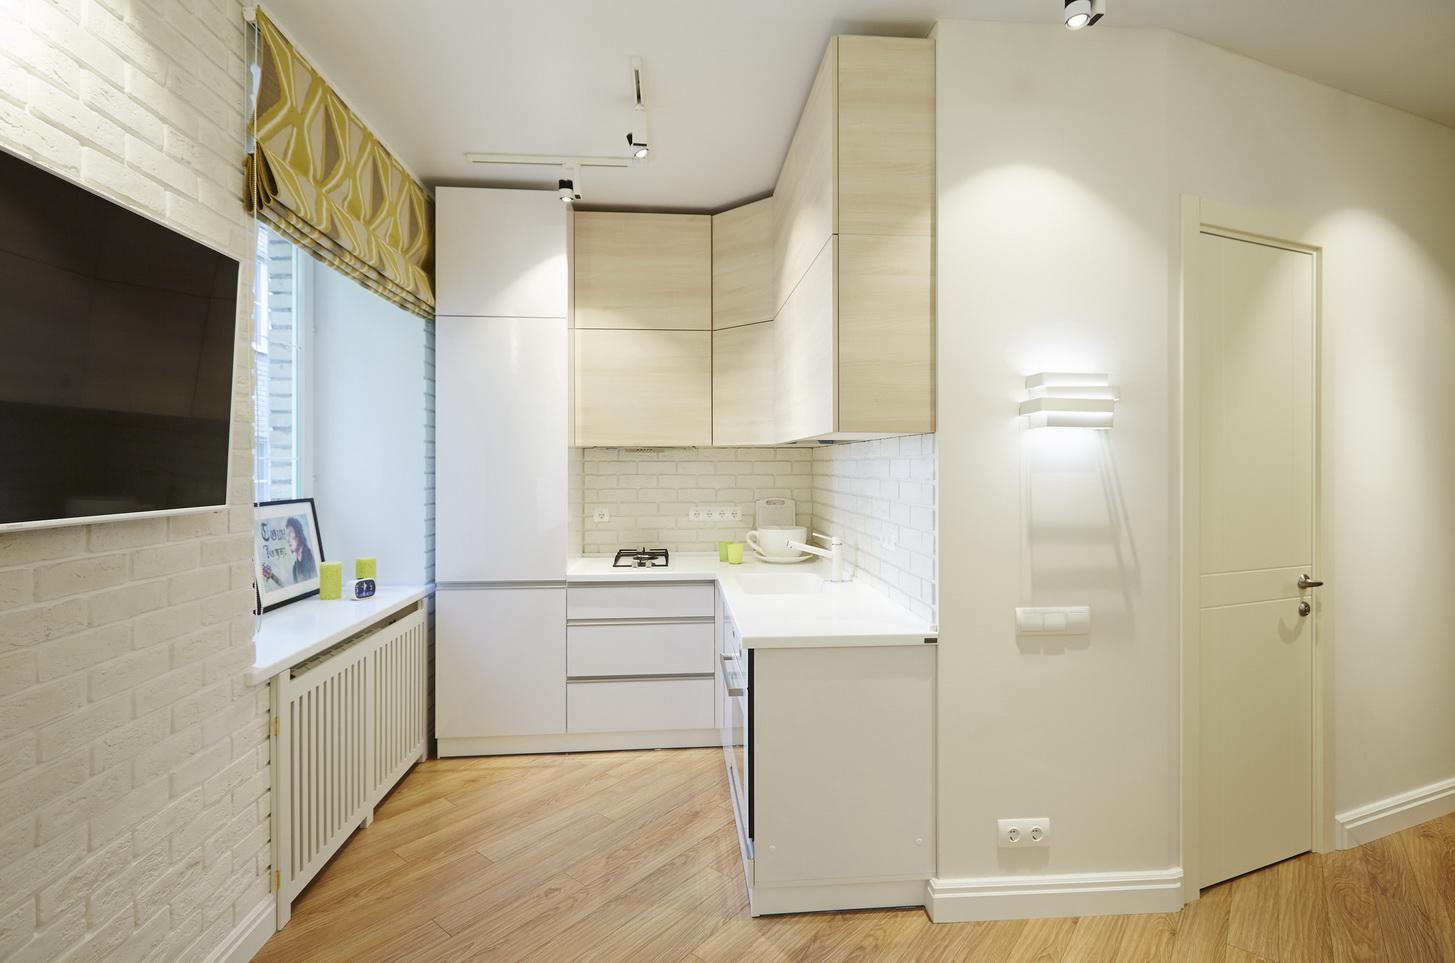 Ремонт однокомнатной квартиры - ммм (5) - 4